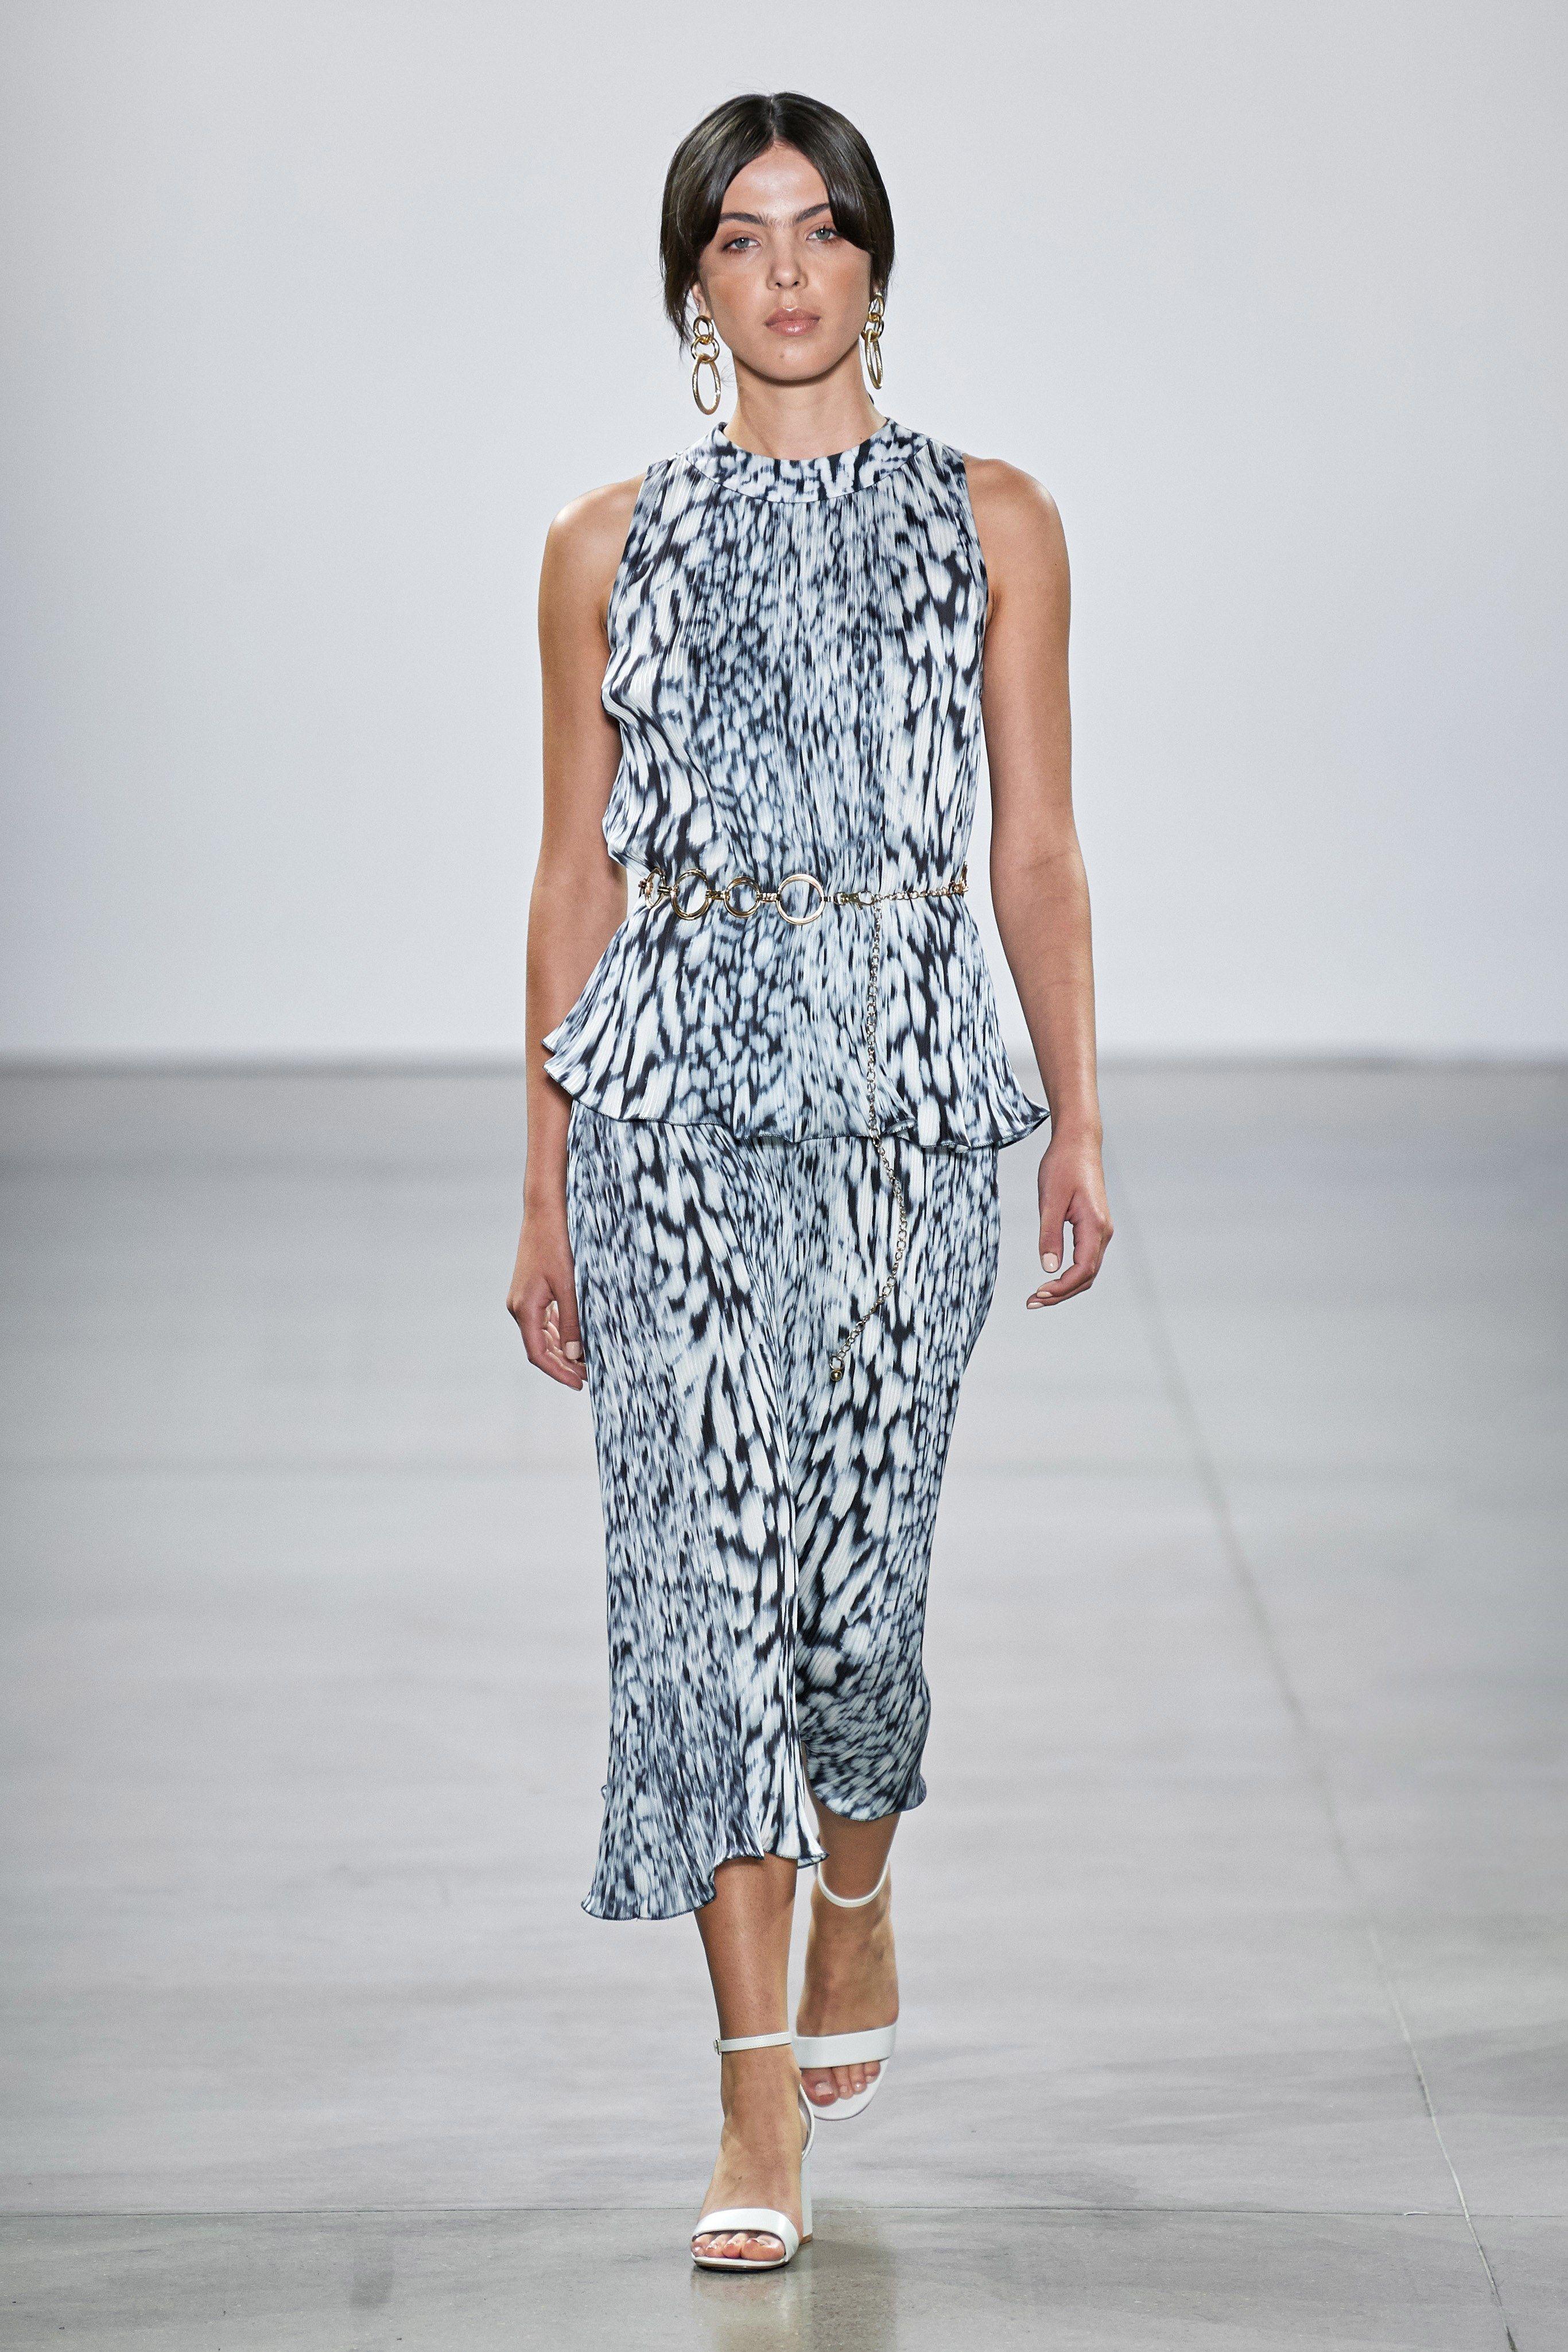 Elie Tahari Spring 2020 Ready To Wear Fashion Show Fashion Spring Collection Fashion Ready To Wear